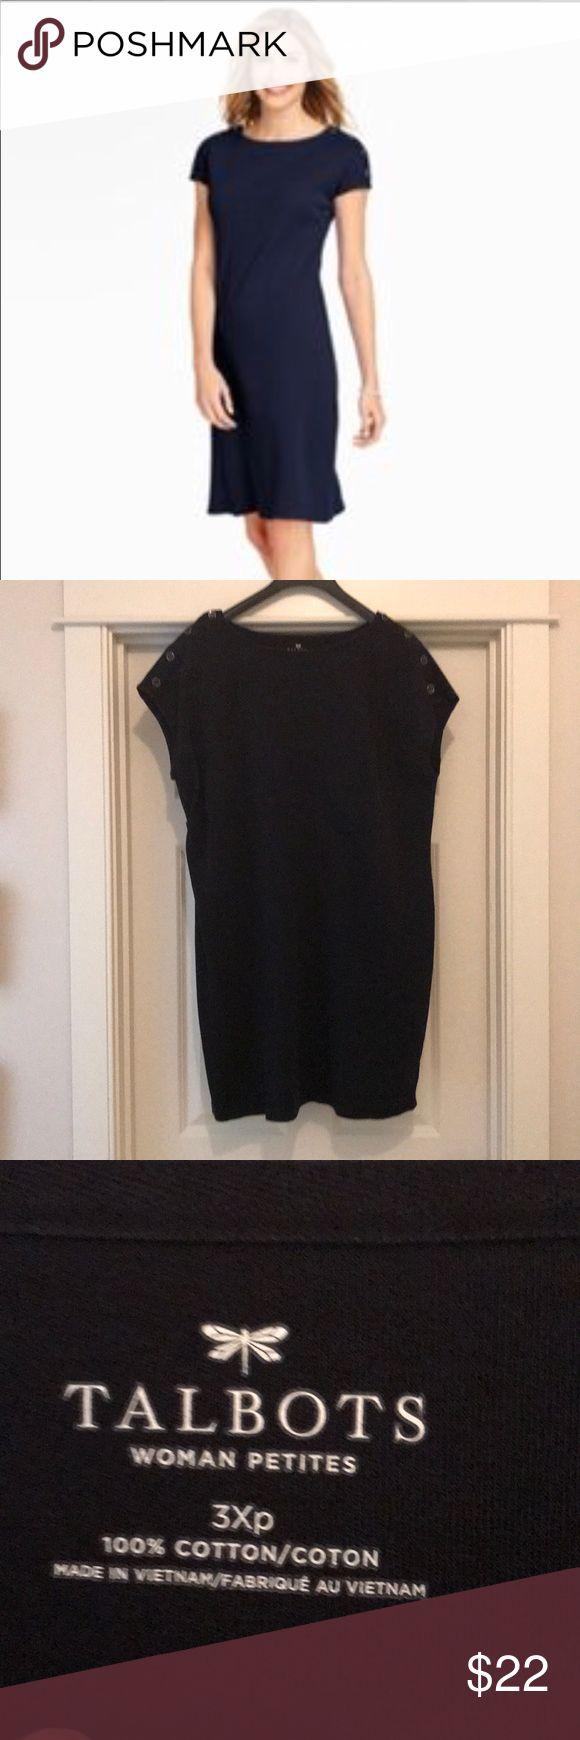 Talbot's Women's Plus Size 3X Petite This is the most adorable dark navy dress!  Talbot's Women's Plus Size 3X Petite!  Check out the buttons that go down each shoulder!  💯% cotton! Talbots Dresses Midi